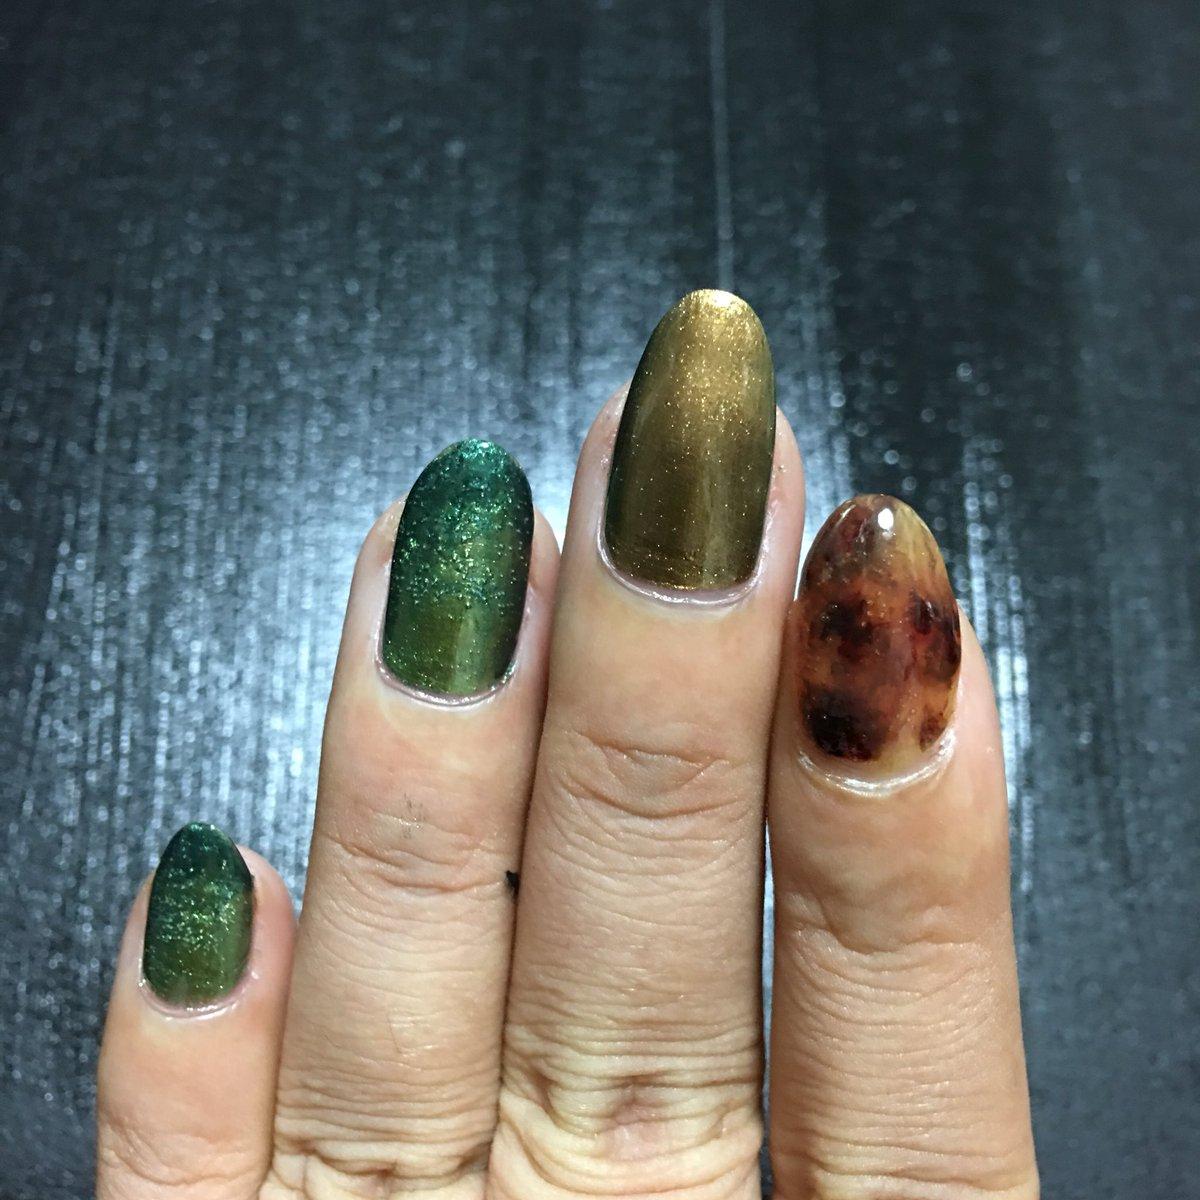 test ツイッターメディア - 什器塗りながら自分の爪も塗る! 気泡も計算ということで?? キャンドゥの速乾トップコートもなかなか優秀!  #ANASUI  #キャンドゥ https://t.co/fpCGKgw1we